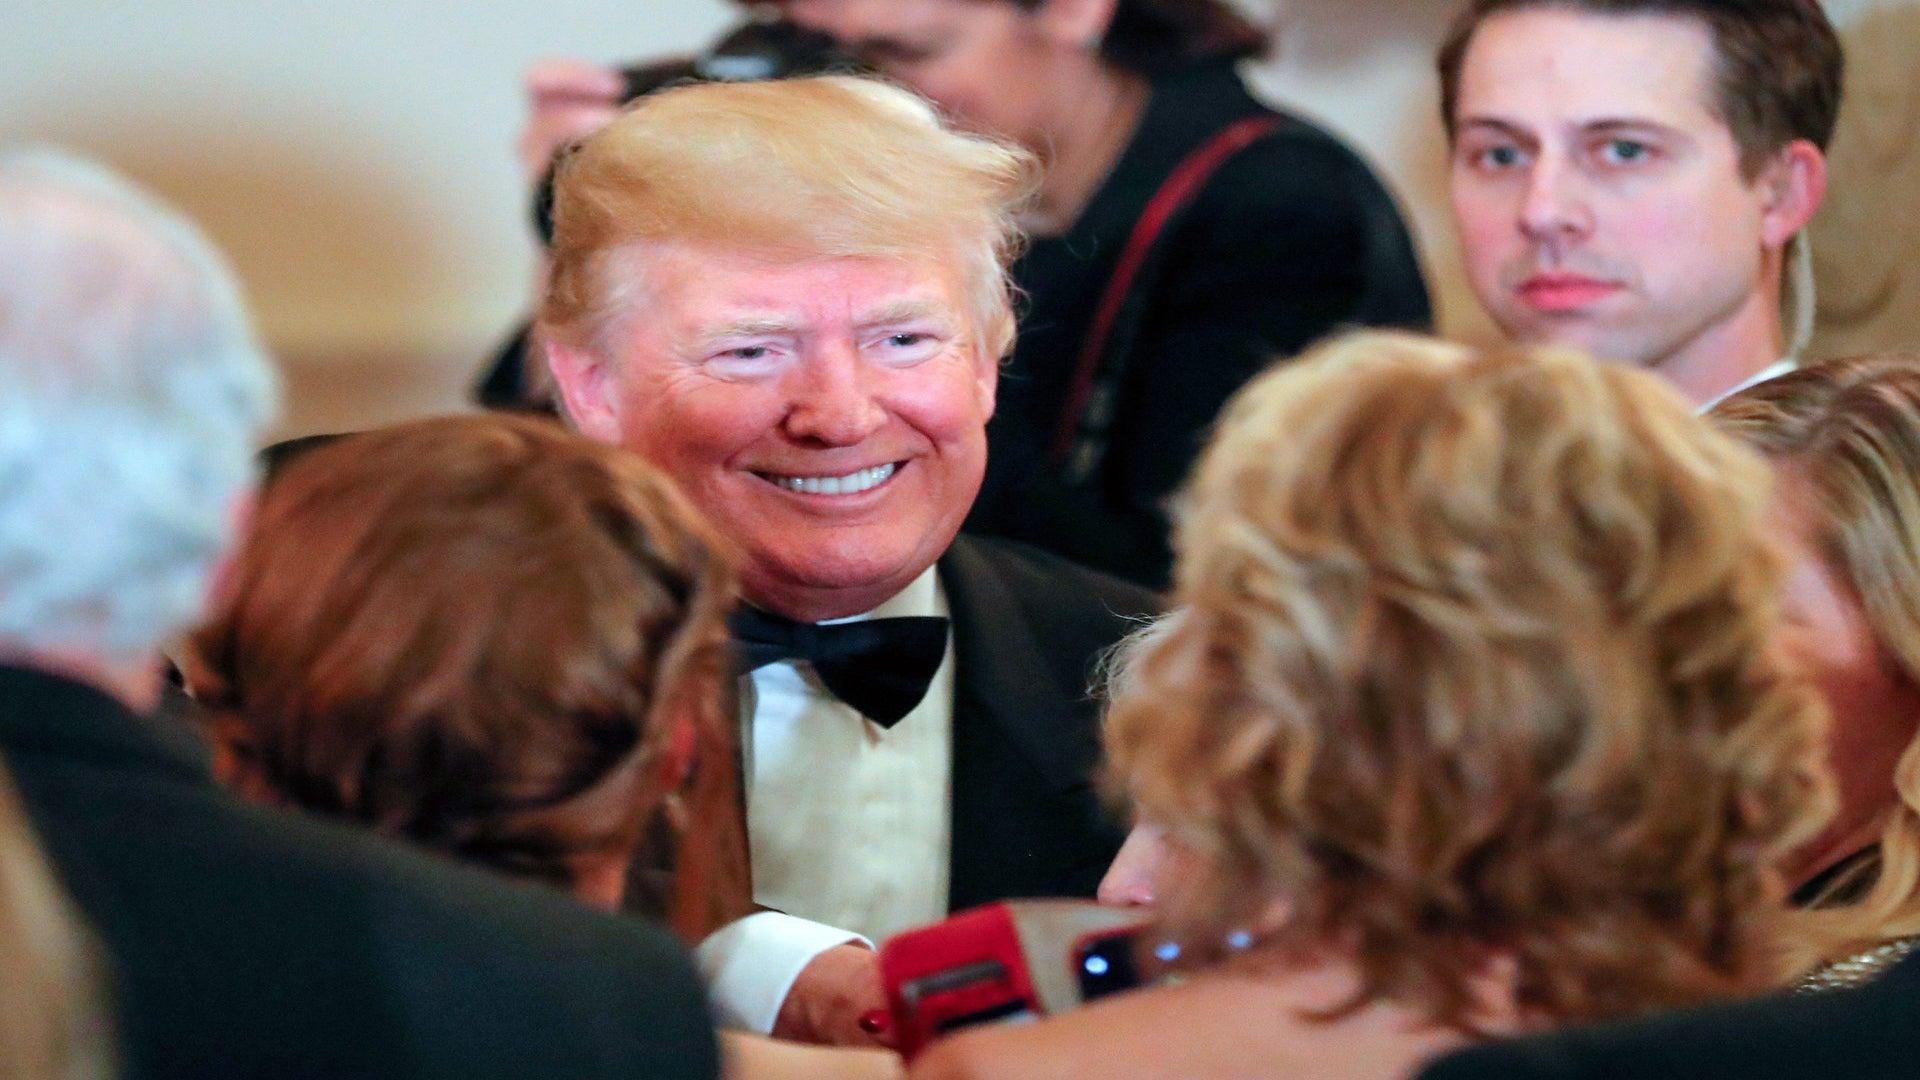 Trump's Border Wall Will Be 'Artistically Designed Steel Slats'